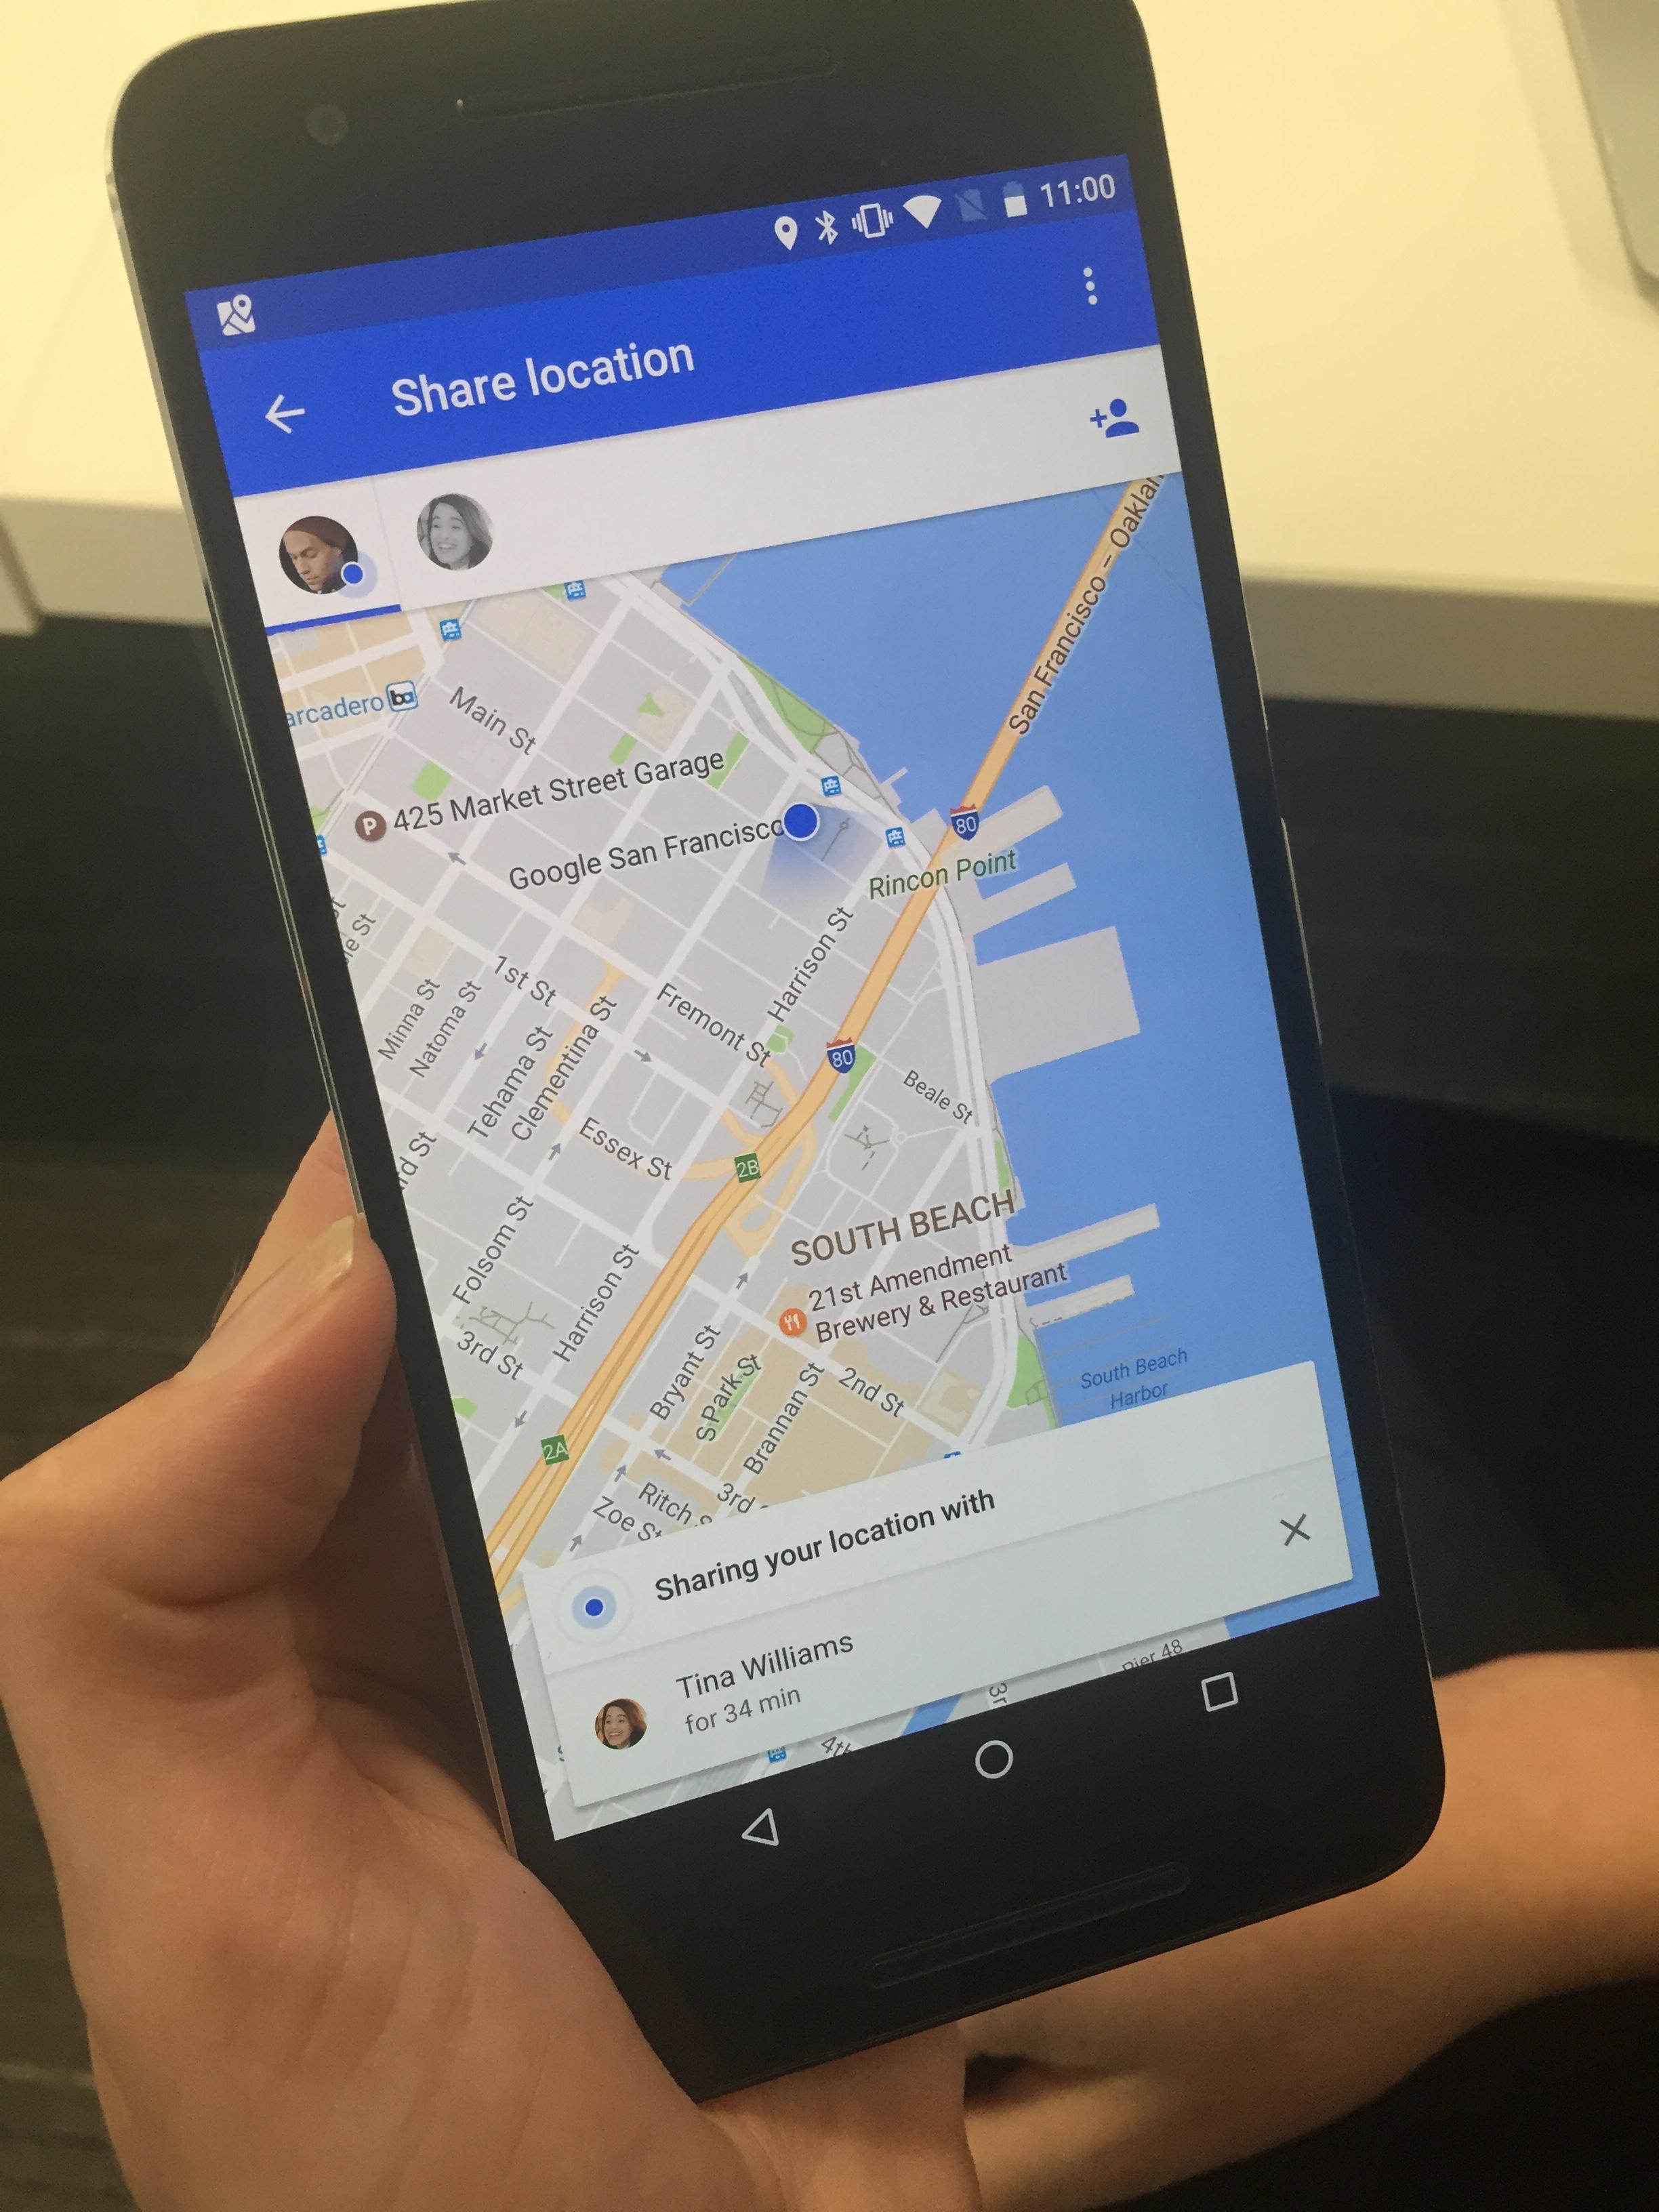 Google updates Location History language after tracking backlash